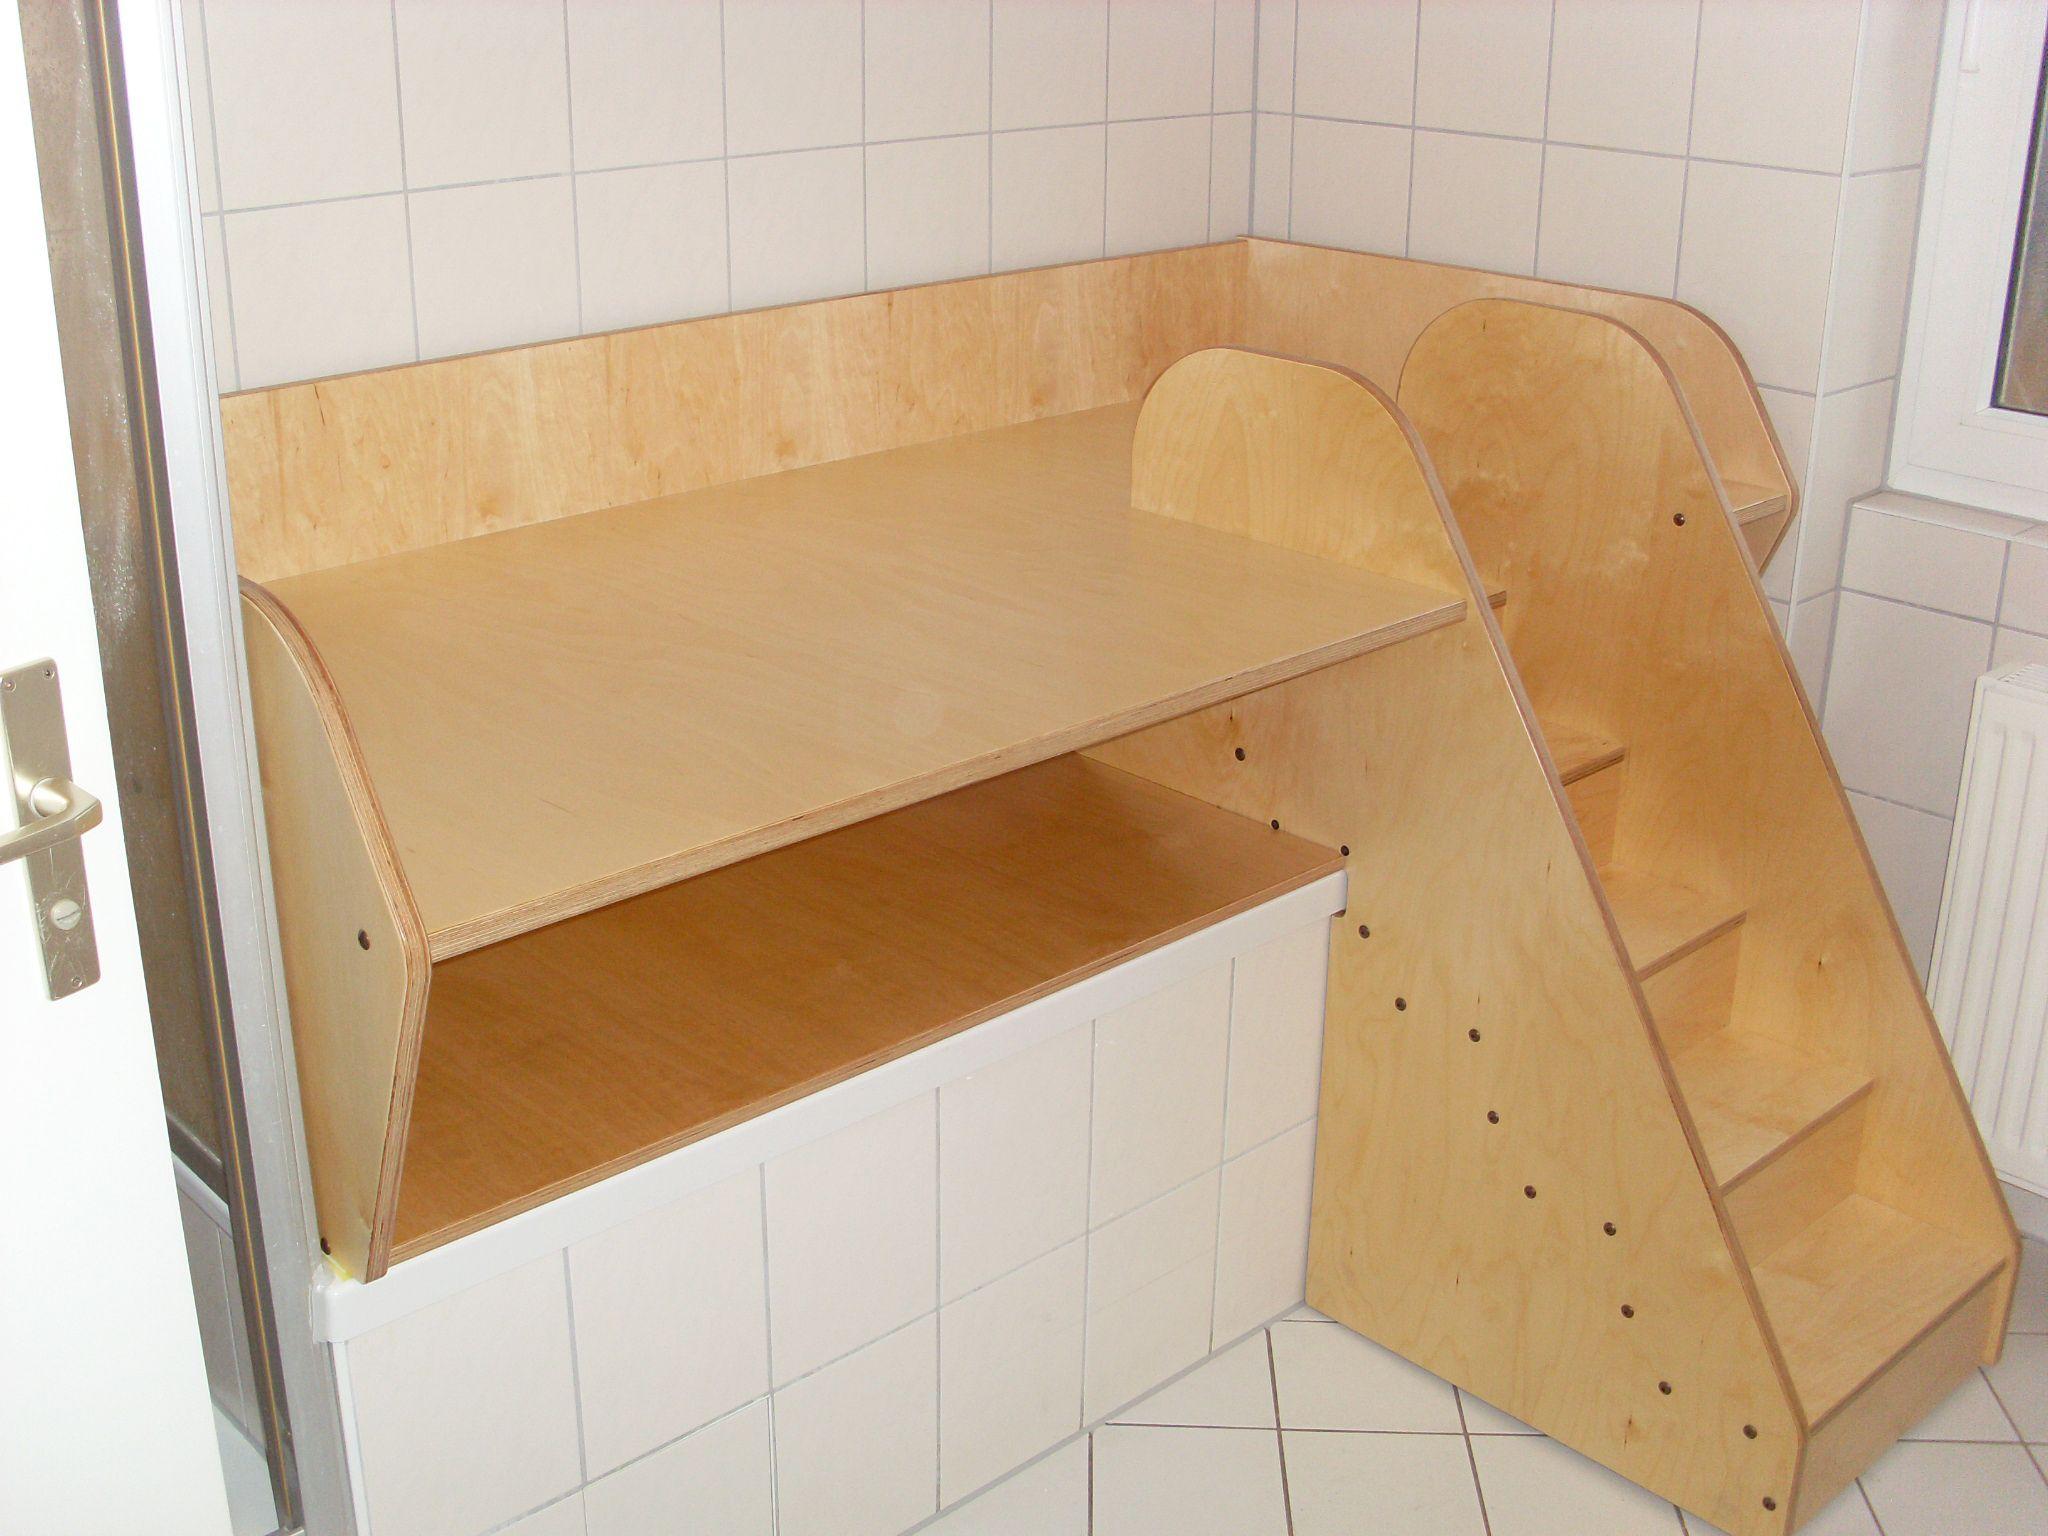 Wickeltisch Wickelkommode Fur Badewanne Einrichtung Wickelkommode Wickeltisch